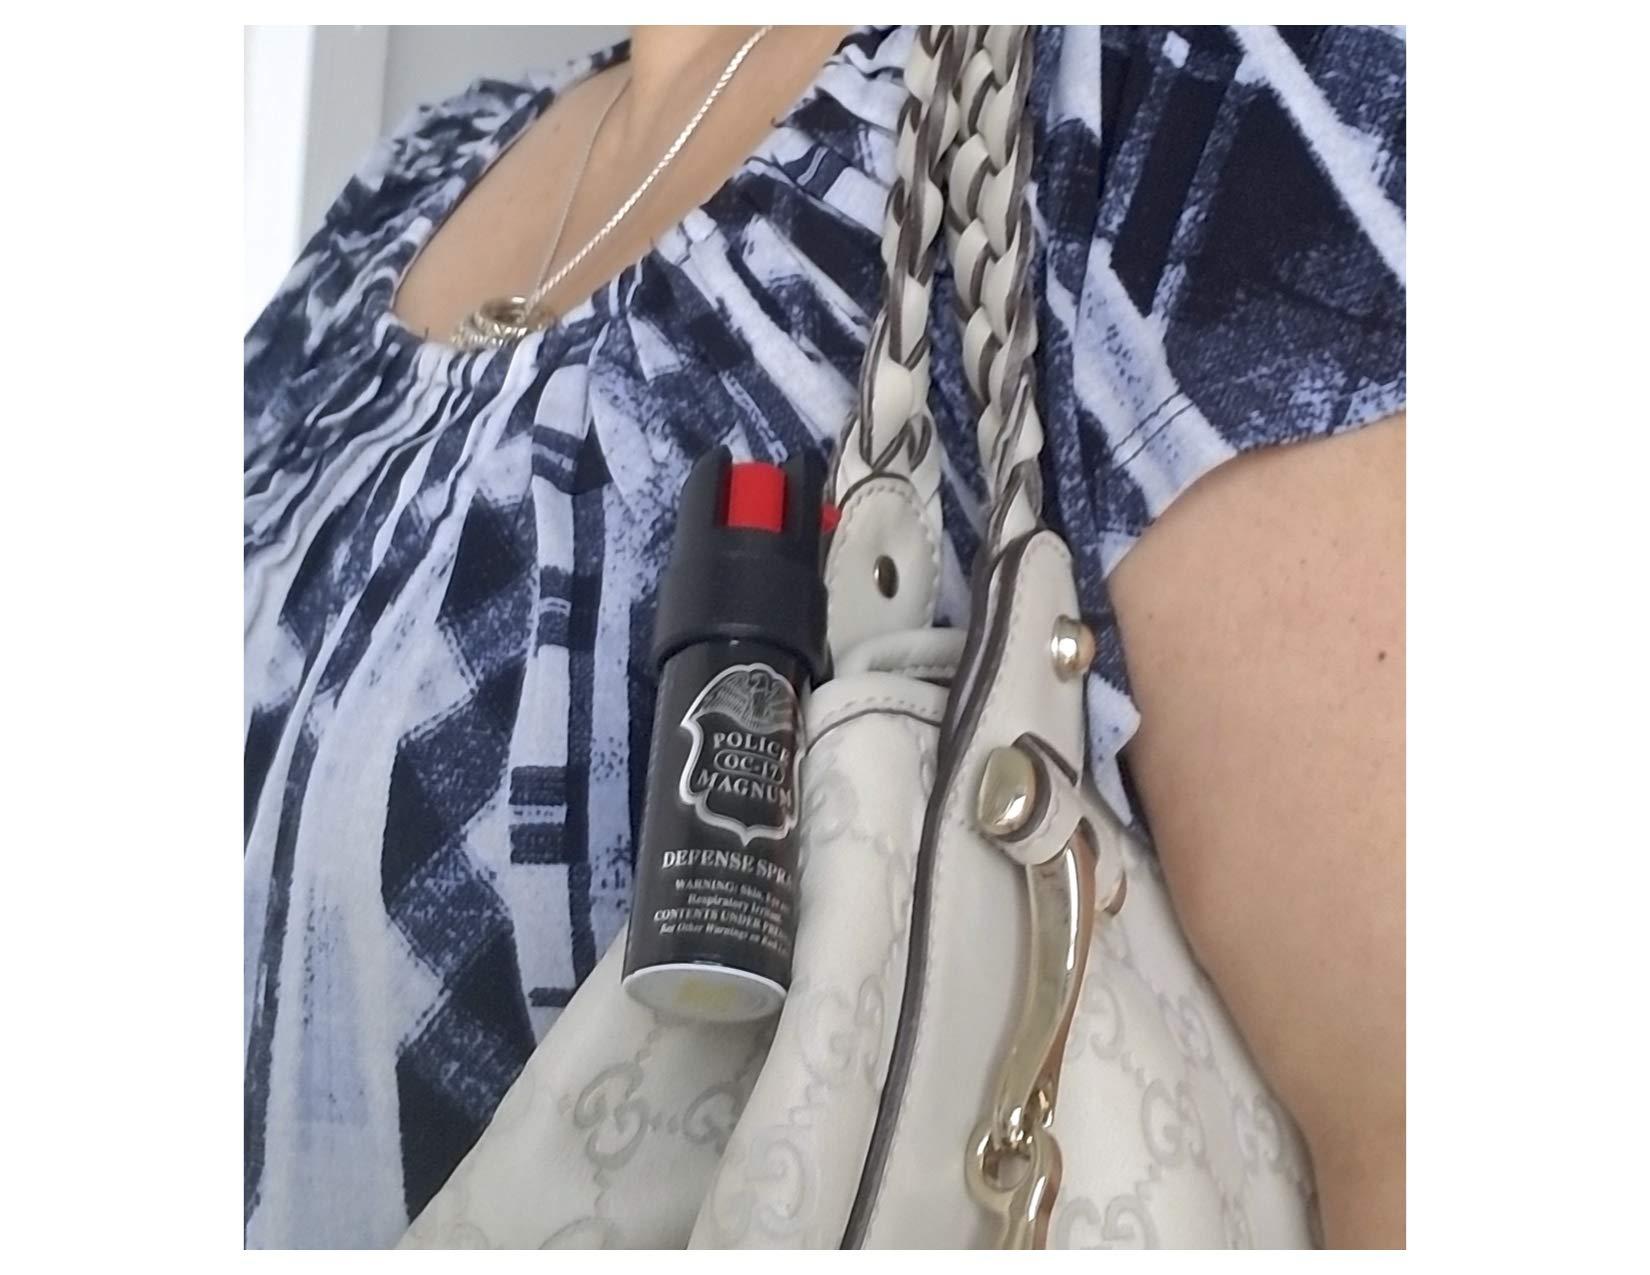 POLICE MAGNUM Pepper Spray Police Strength Self Defense OC Black Pepper Spray Set 6 Pack 0.5 oz Twist Top Pocket Clip UV Identifying Dye - Pepper Sprays Self Defense for Women Multiple Blasts 12ft by POLICE MAGNUM